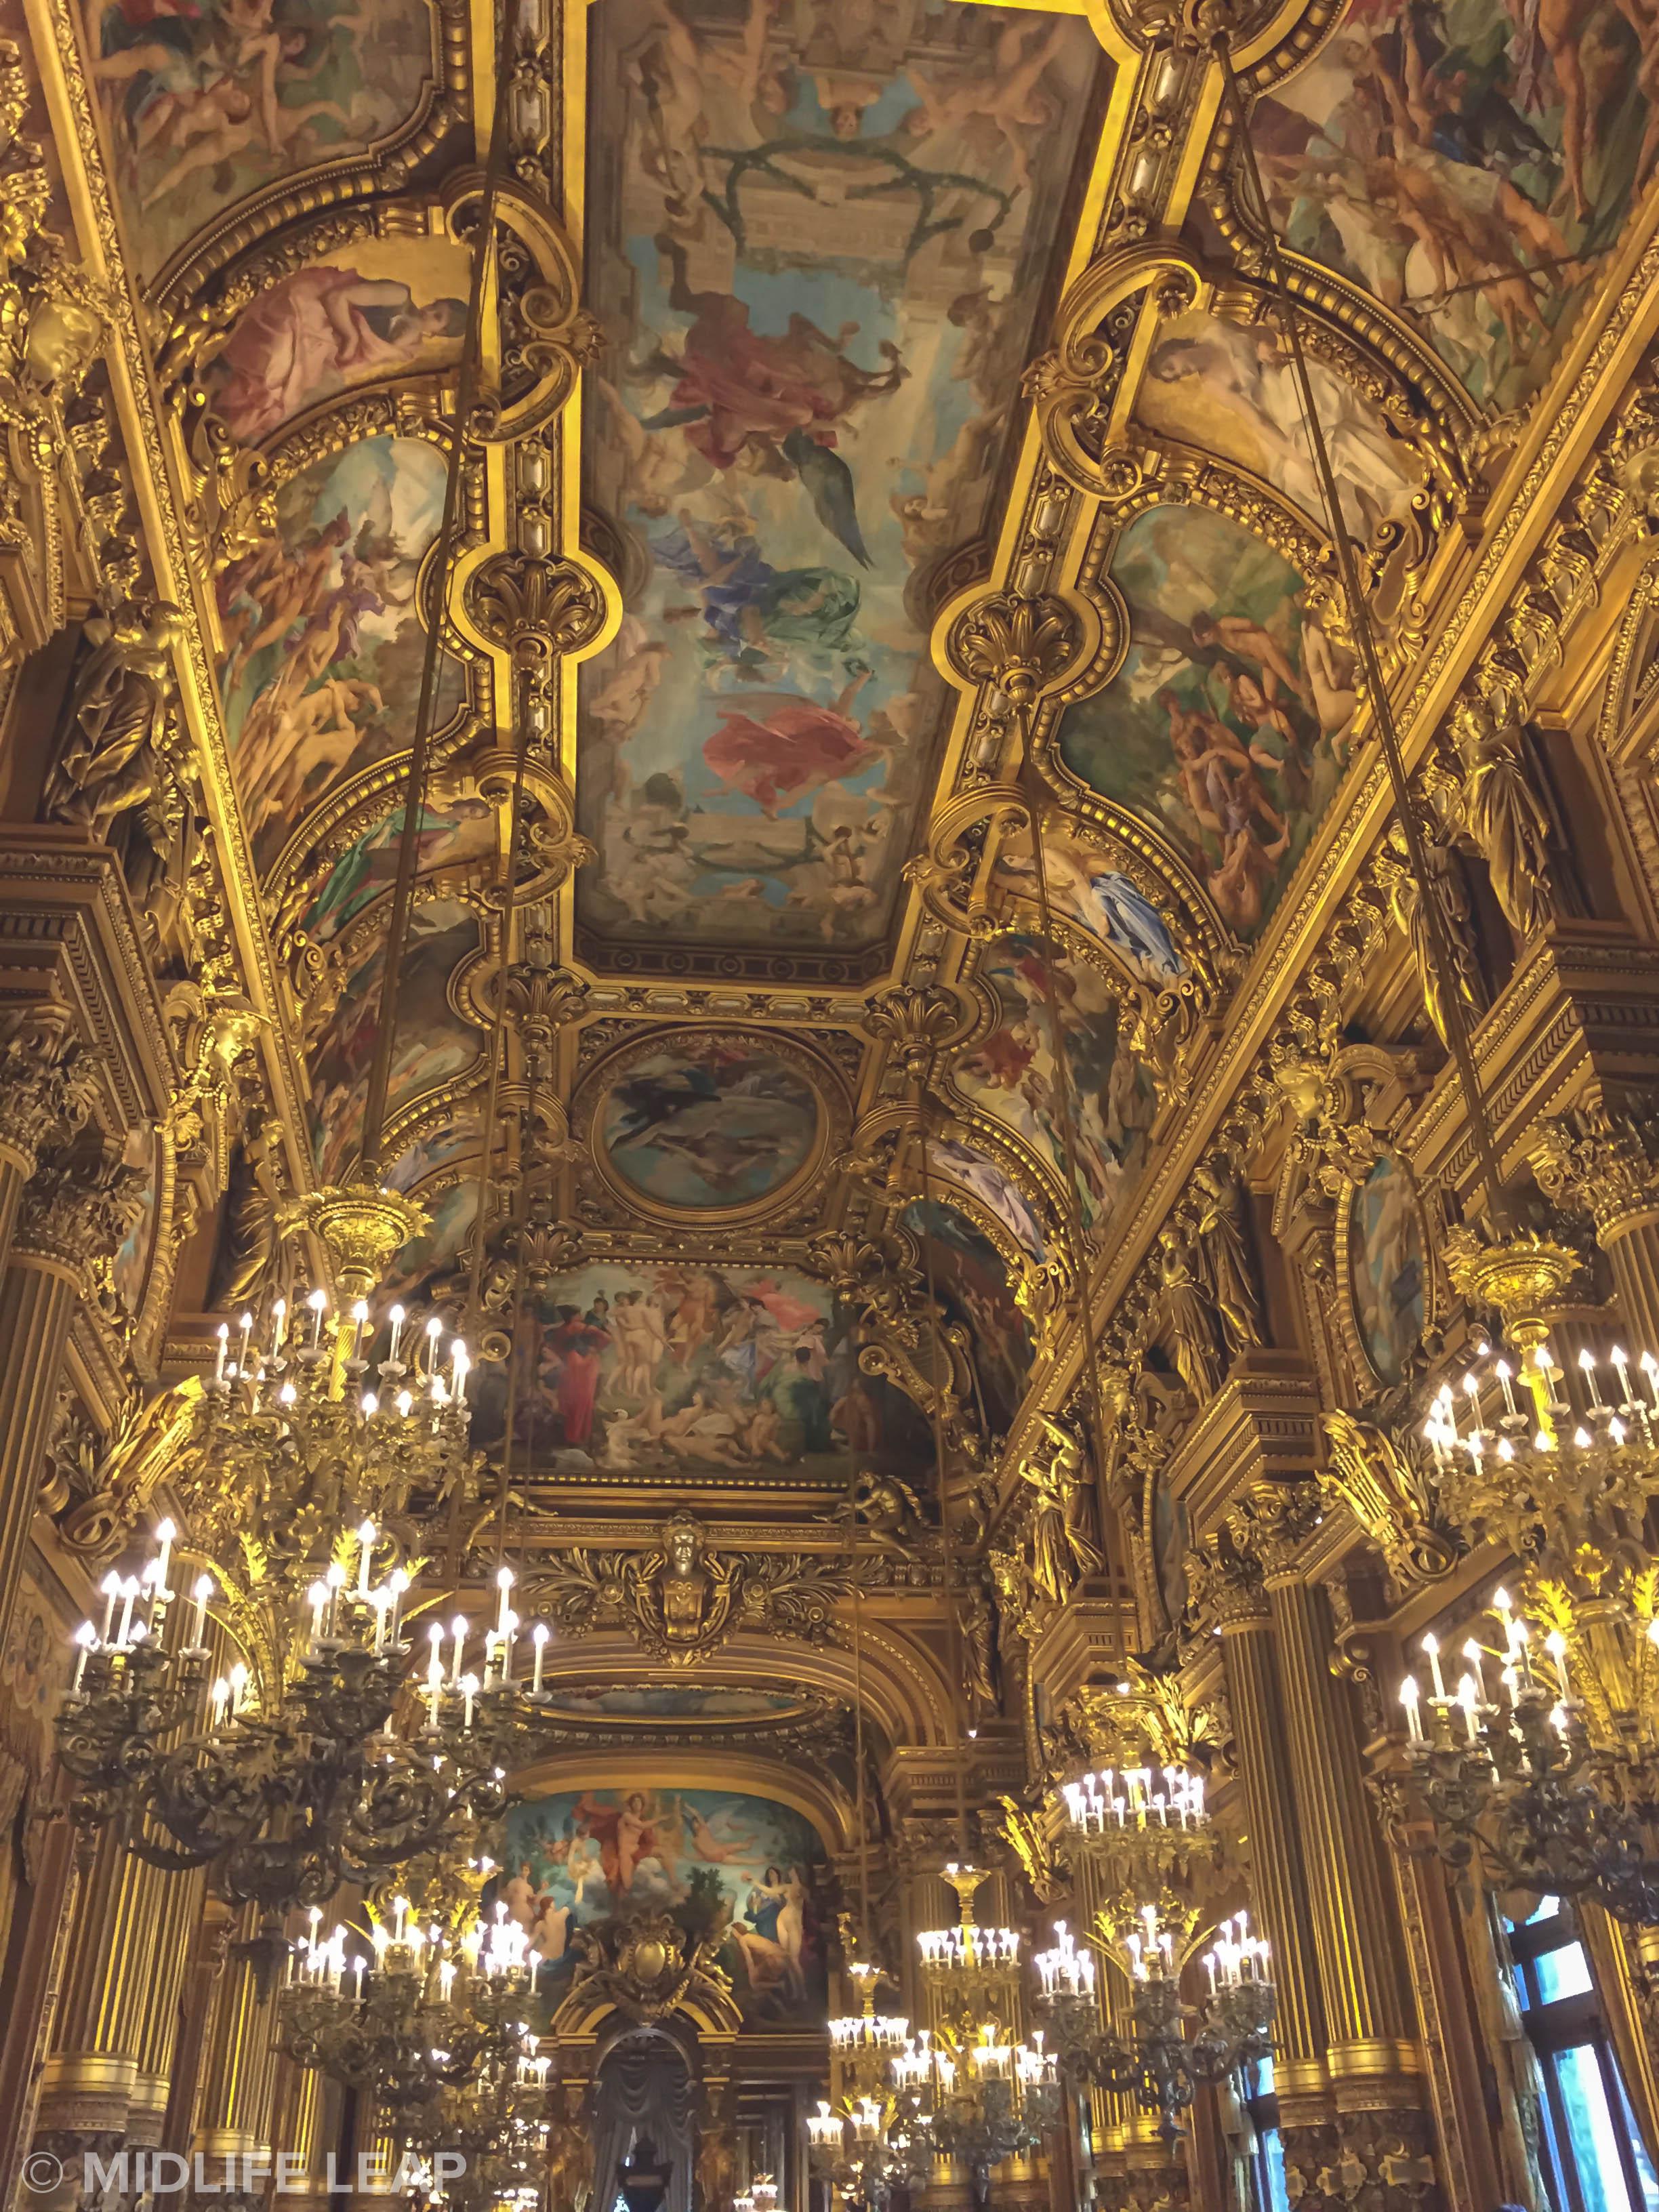 daily-tours-for-the-opera-house-palais-garnier-paris